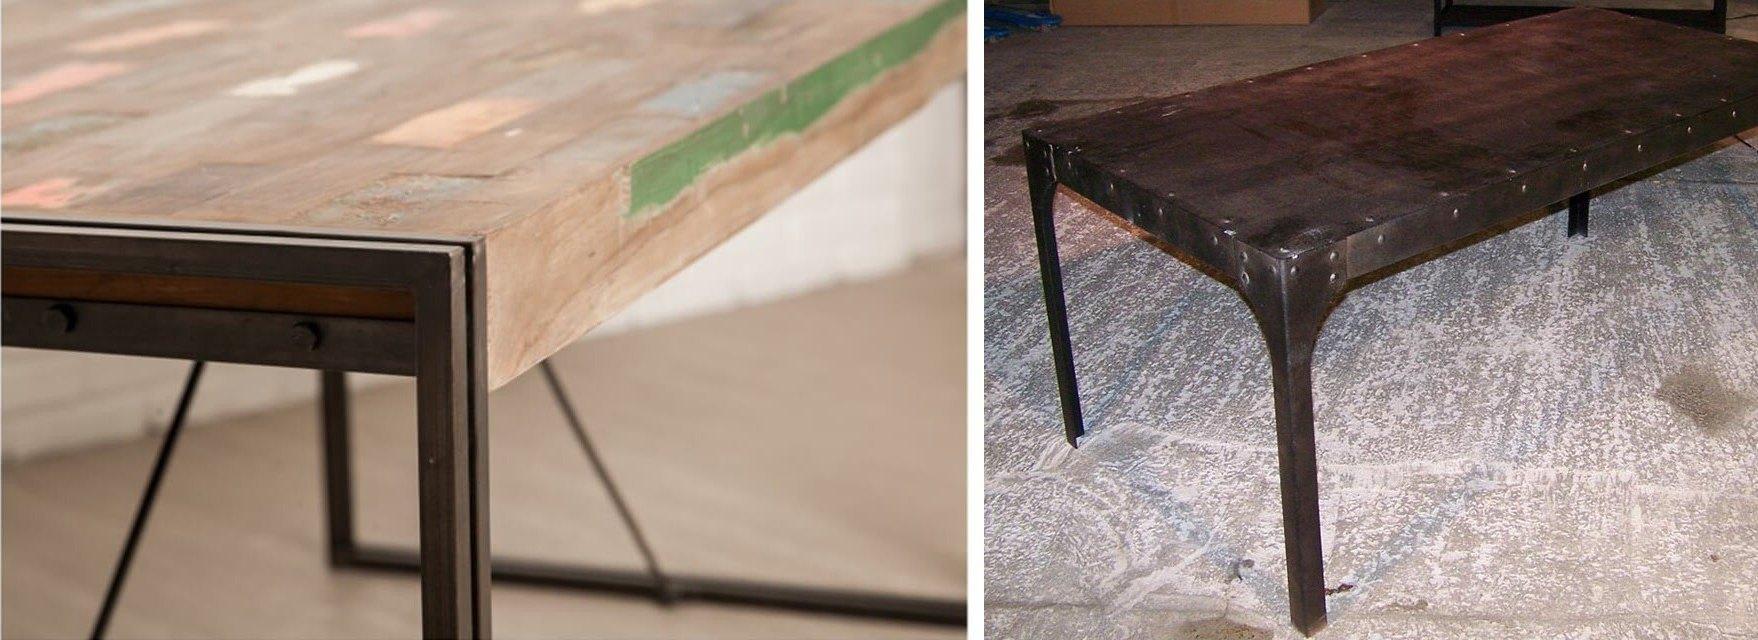 Table industrielle en métal